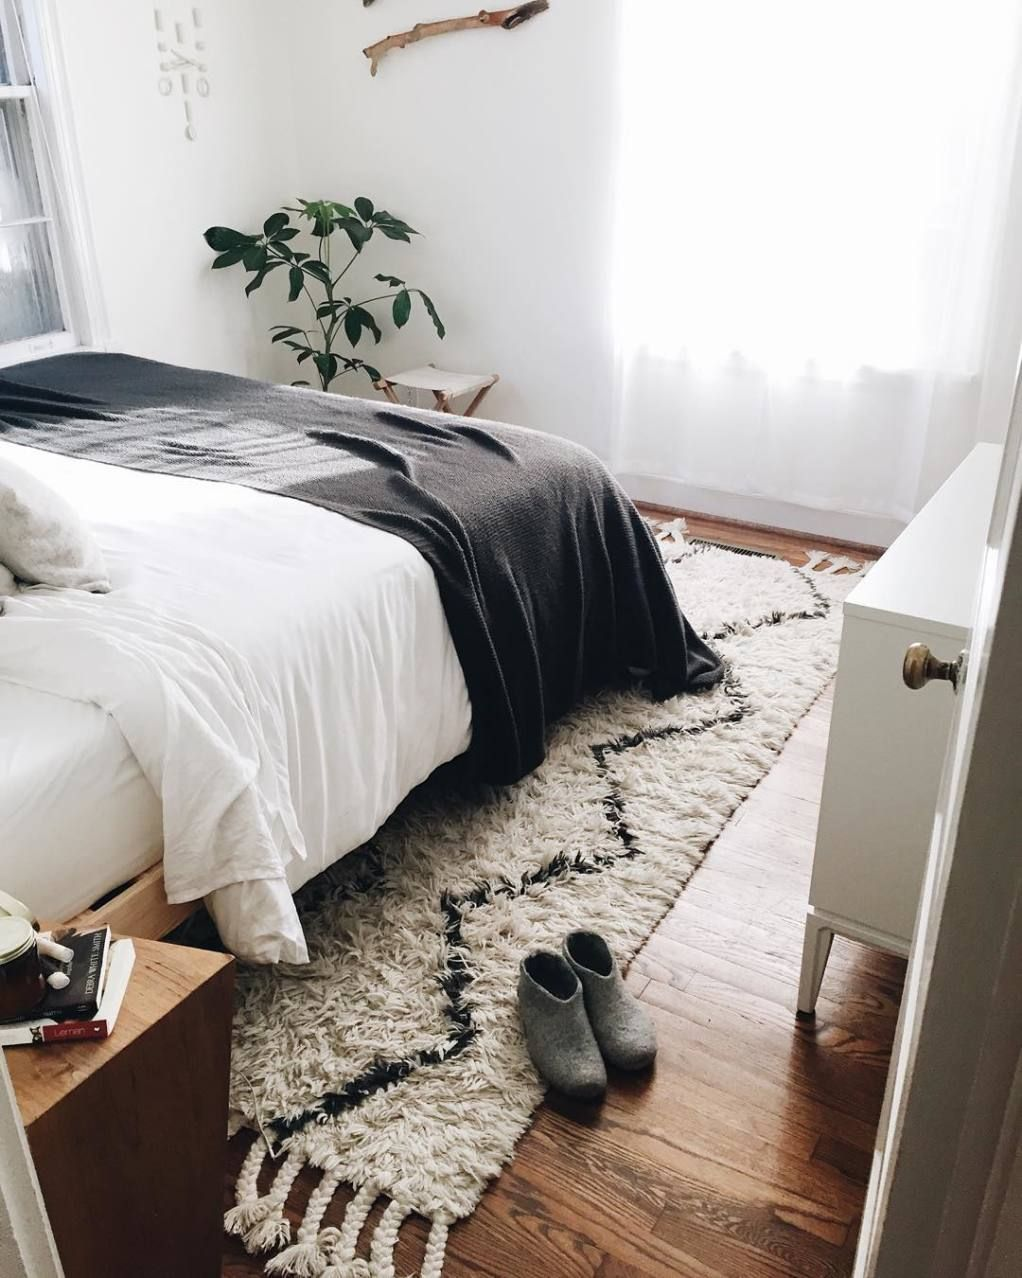 3 bedroom house interior design  examples of minimal interior design   ultralinx  home